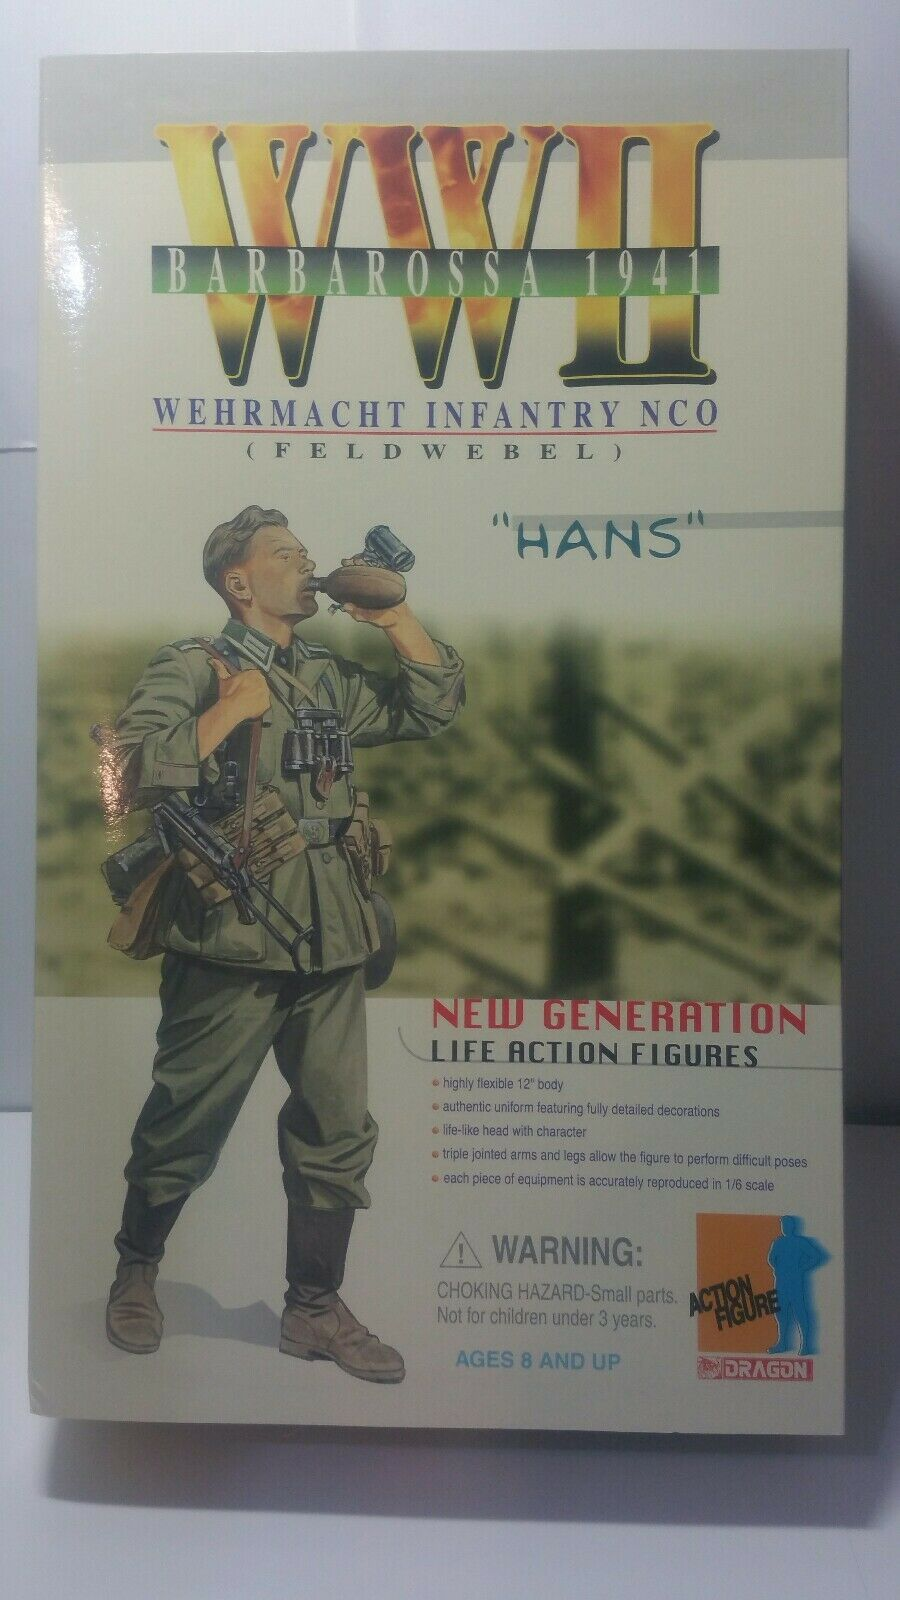 Dragon WWII Barbarossa 1941 Wehrmacht Infantry NCO  12  azione cifra Hans 70002  alto sconto